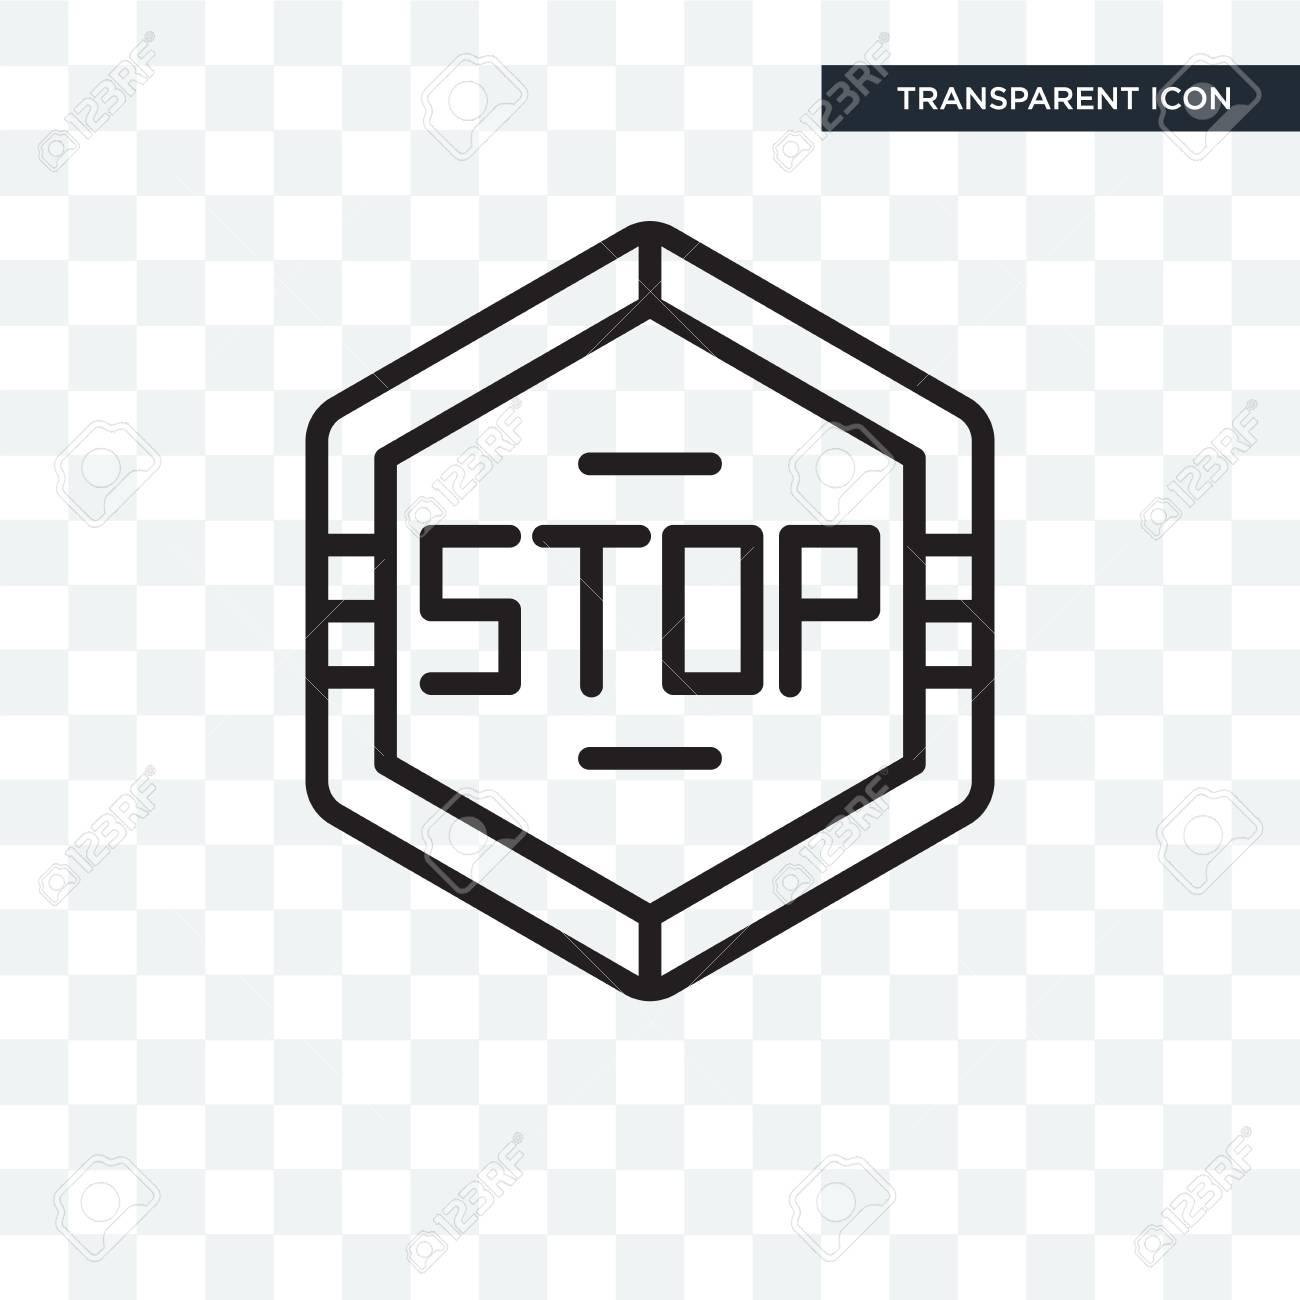 Stop hexagonal illustration icon isolated on transparent background